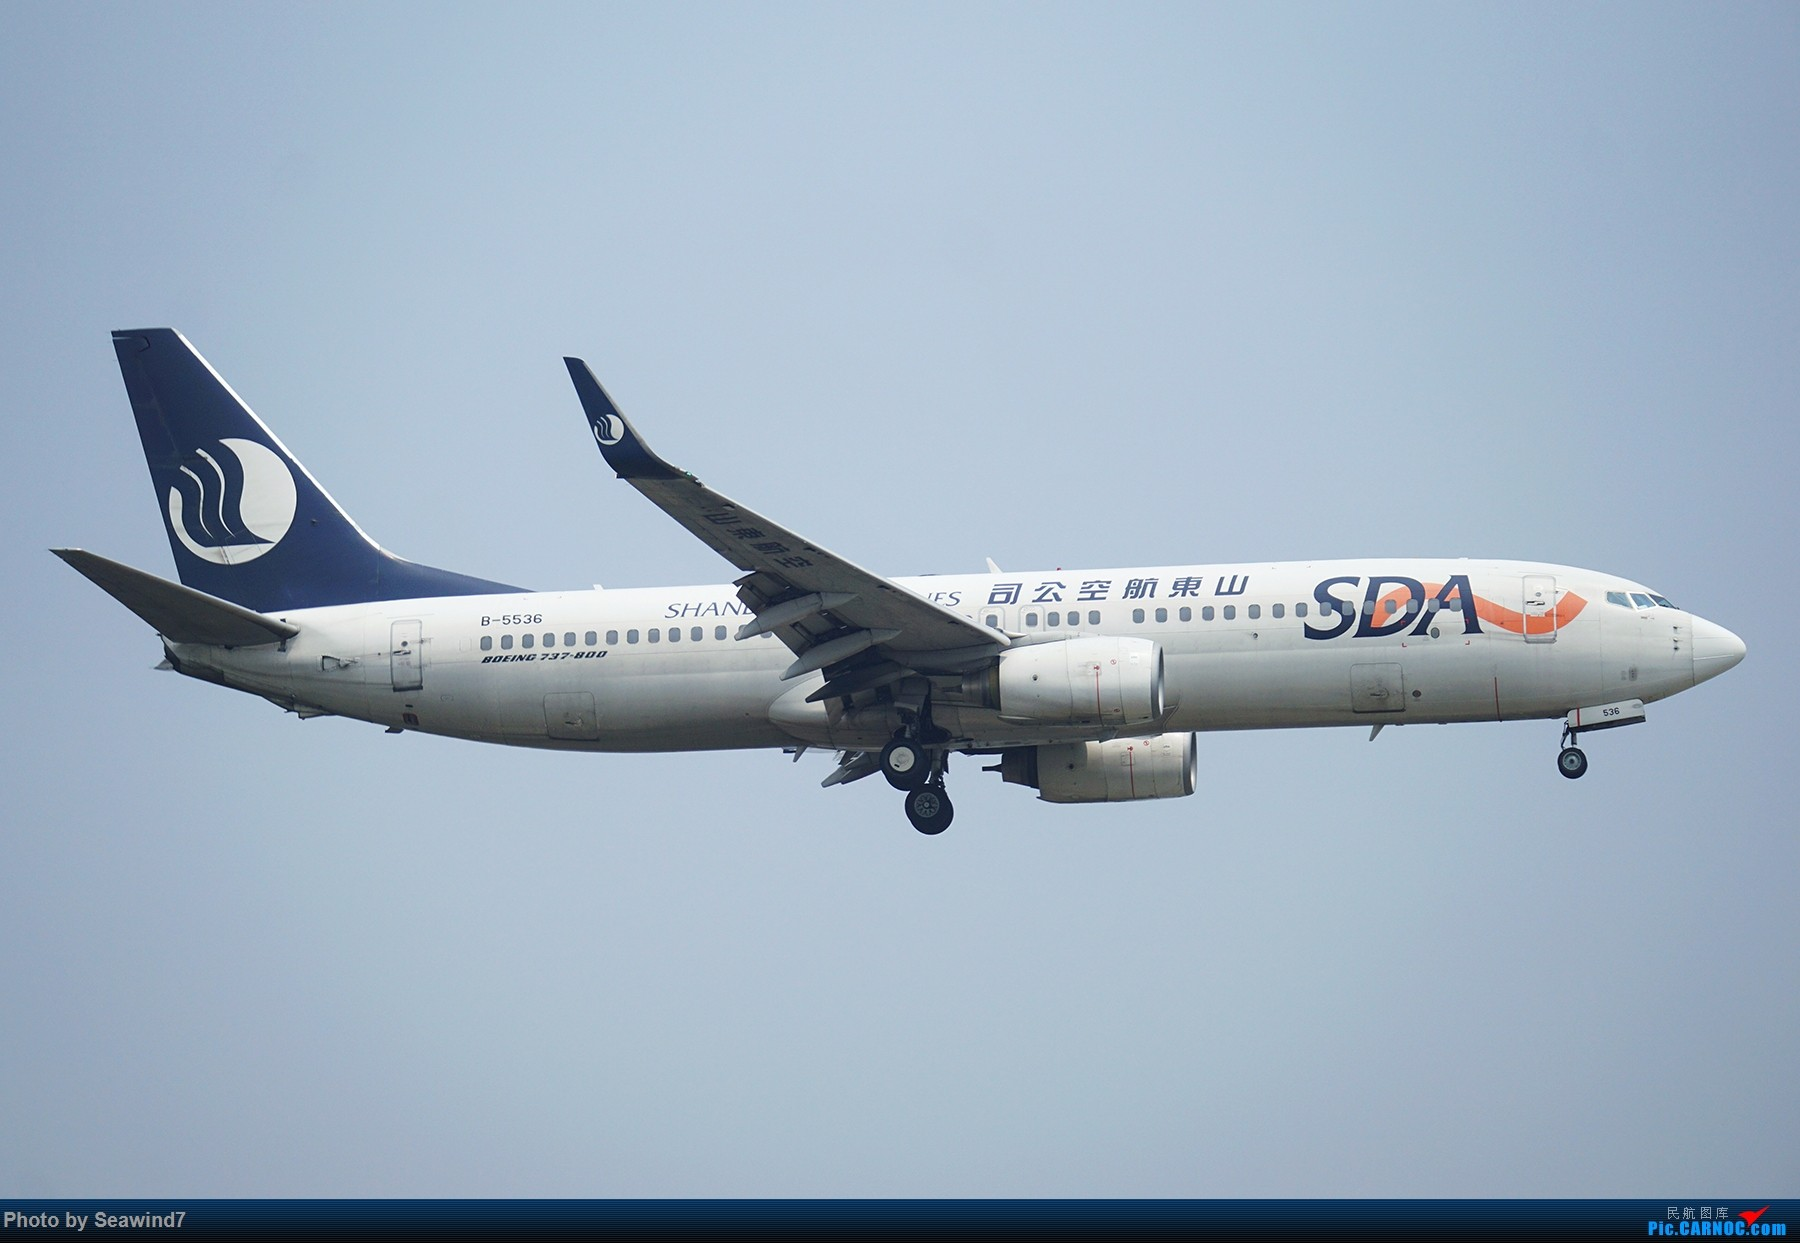 Re:[原创]新手的五一假期(含玩具总动员) BOEING 737-800 B-5536 中国上海虹桥国际机场